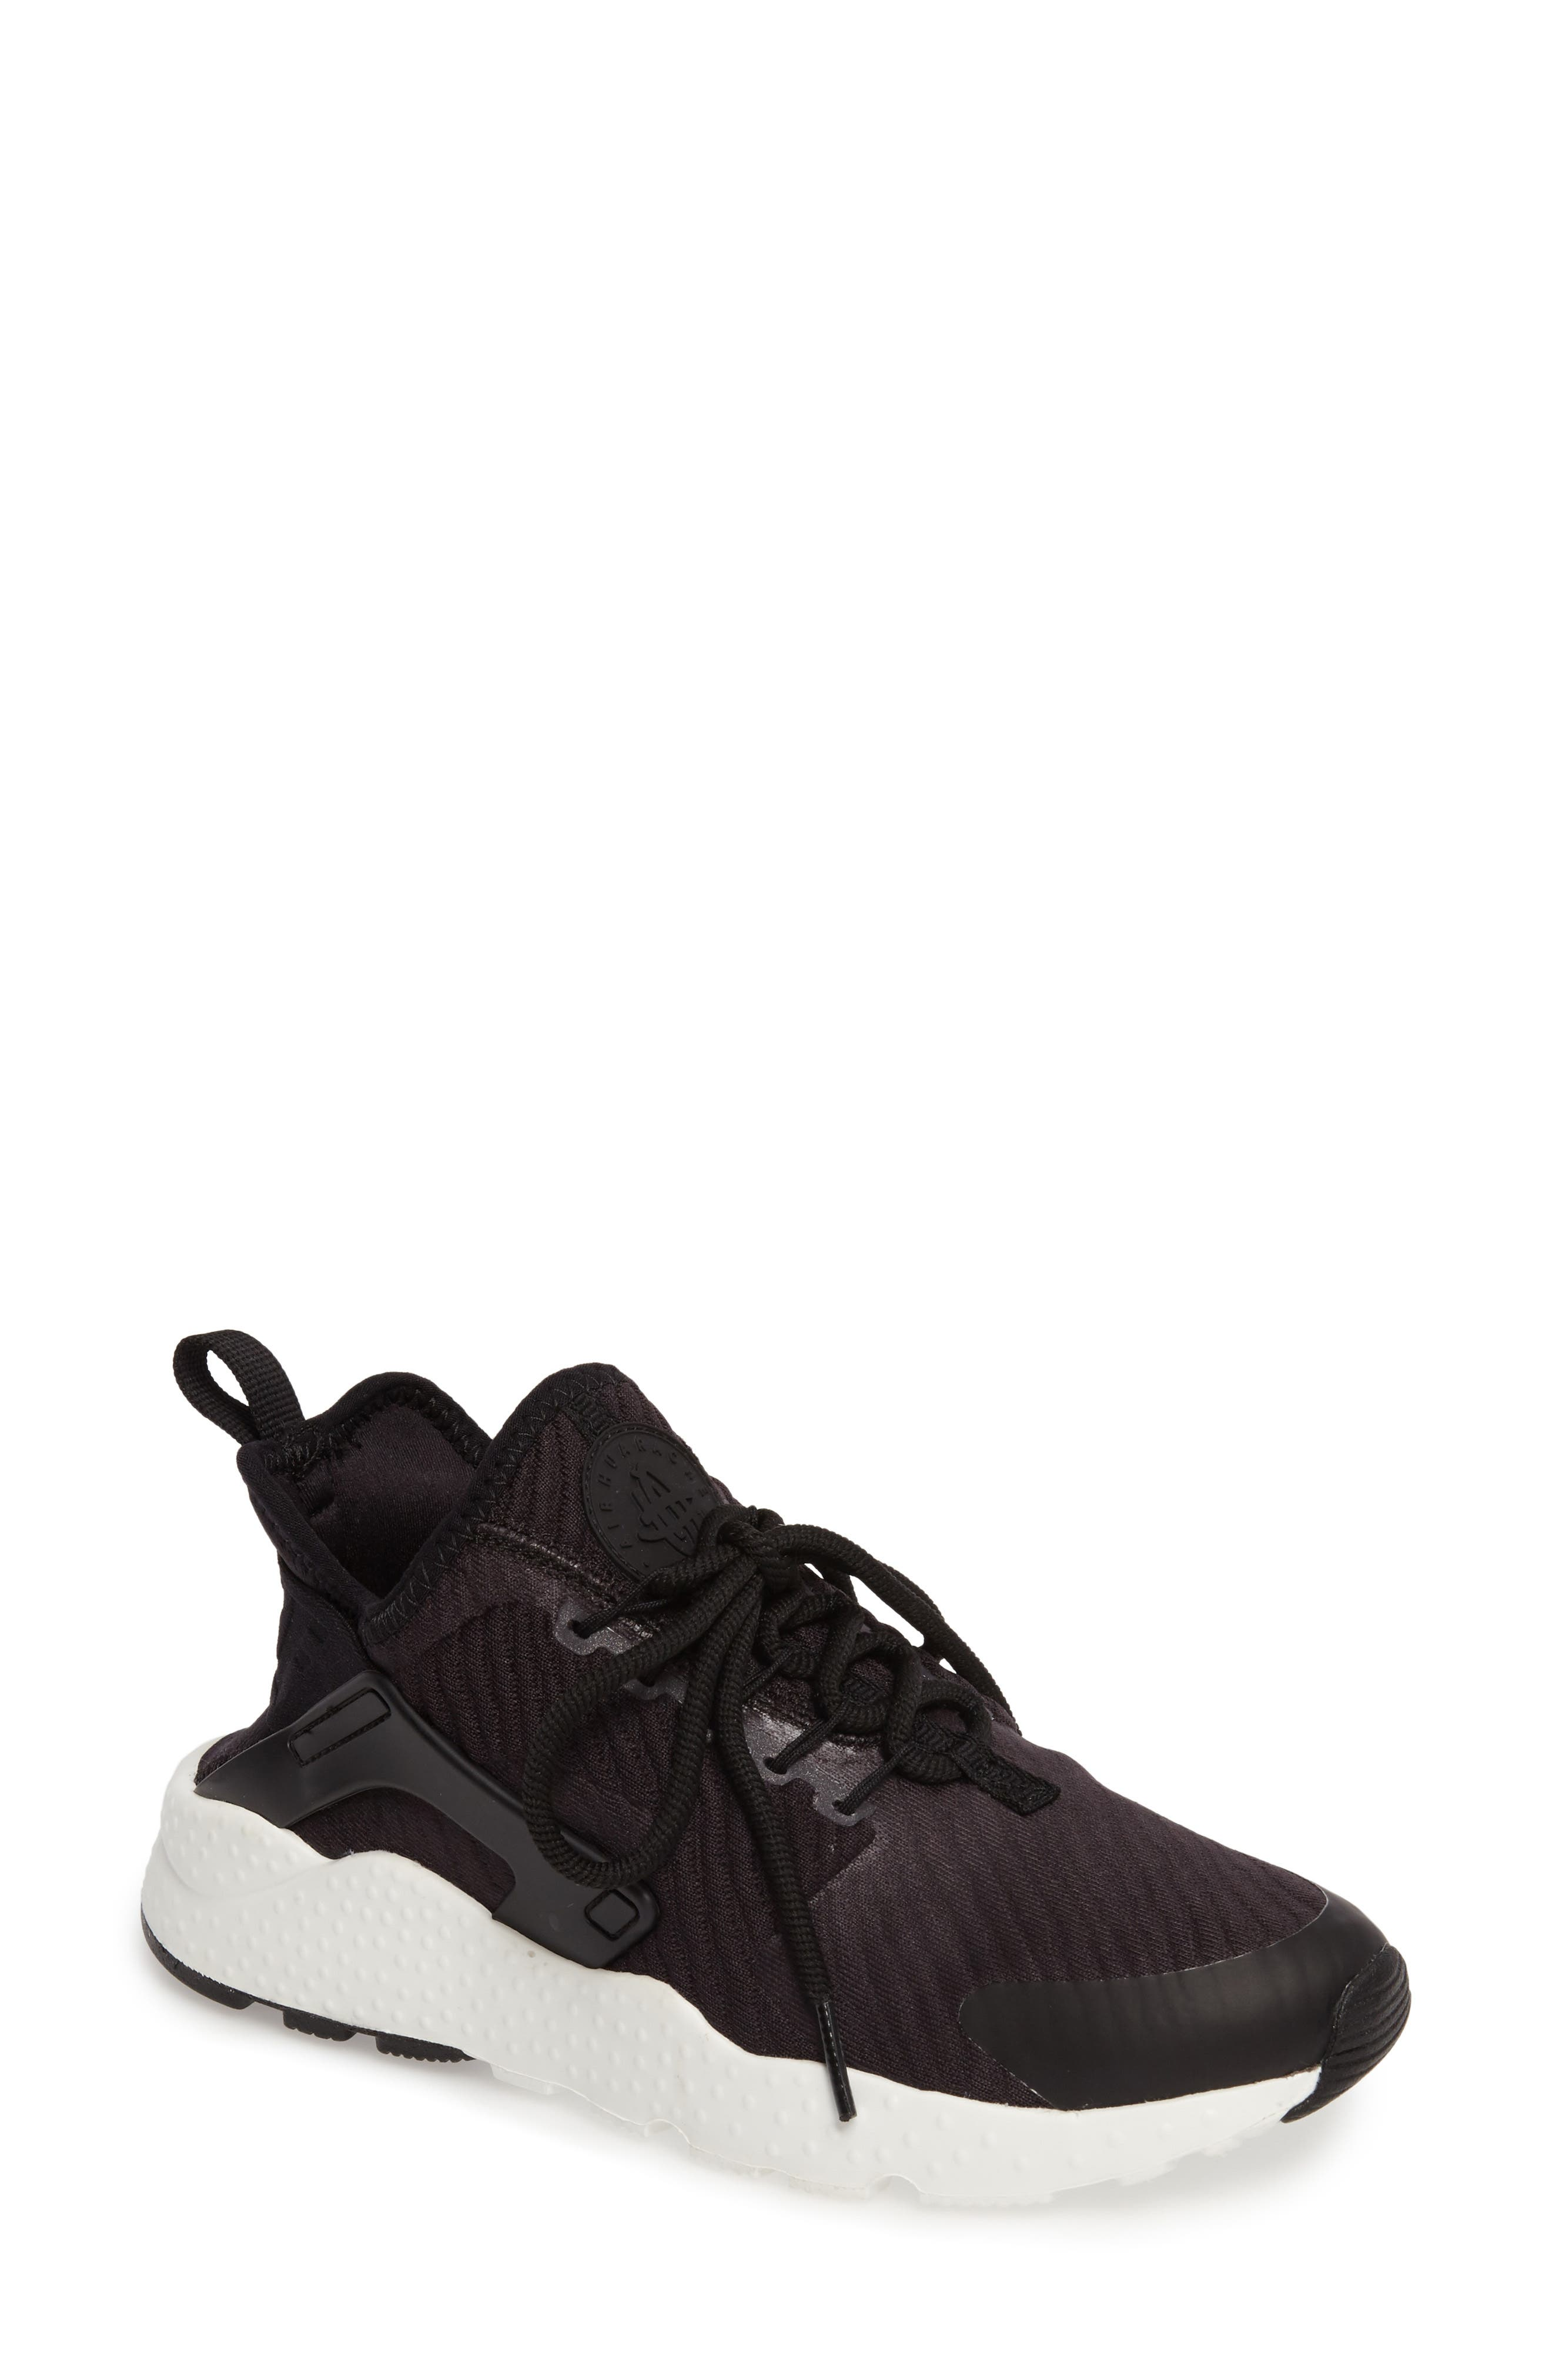 Main Image - Nike 'Air Huarache Run Ultra SE' Sneaker (Women)